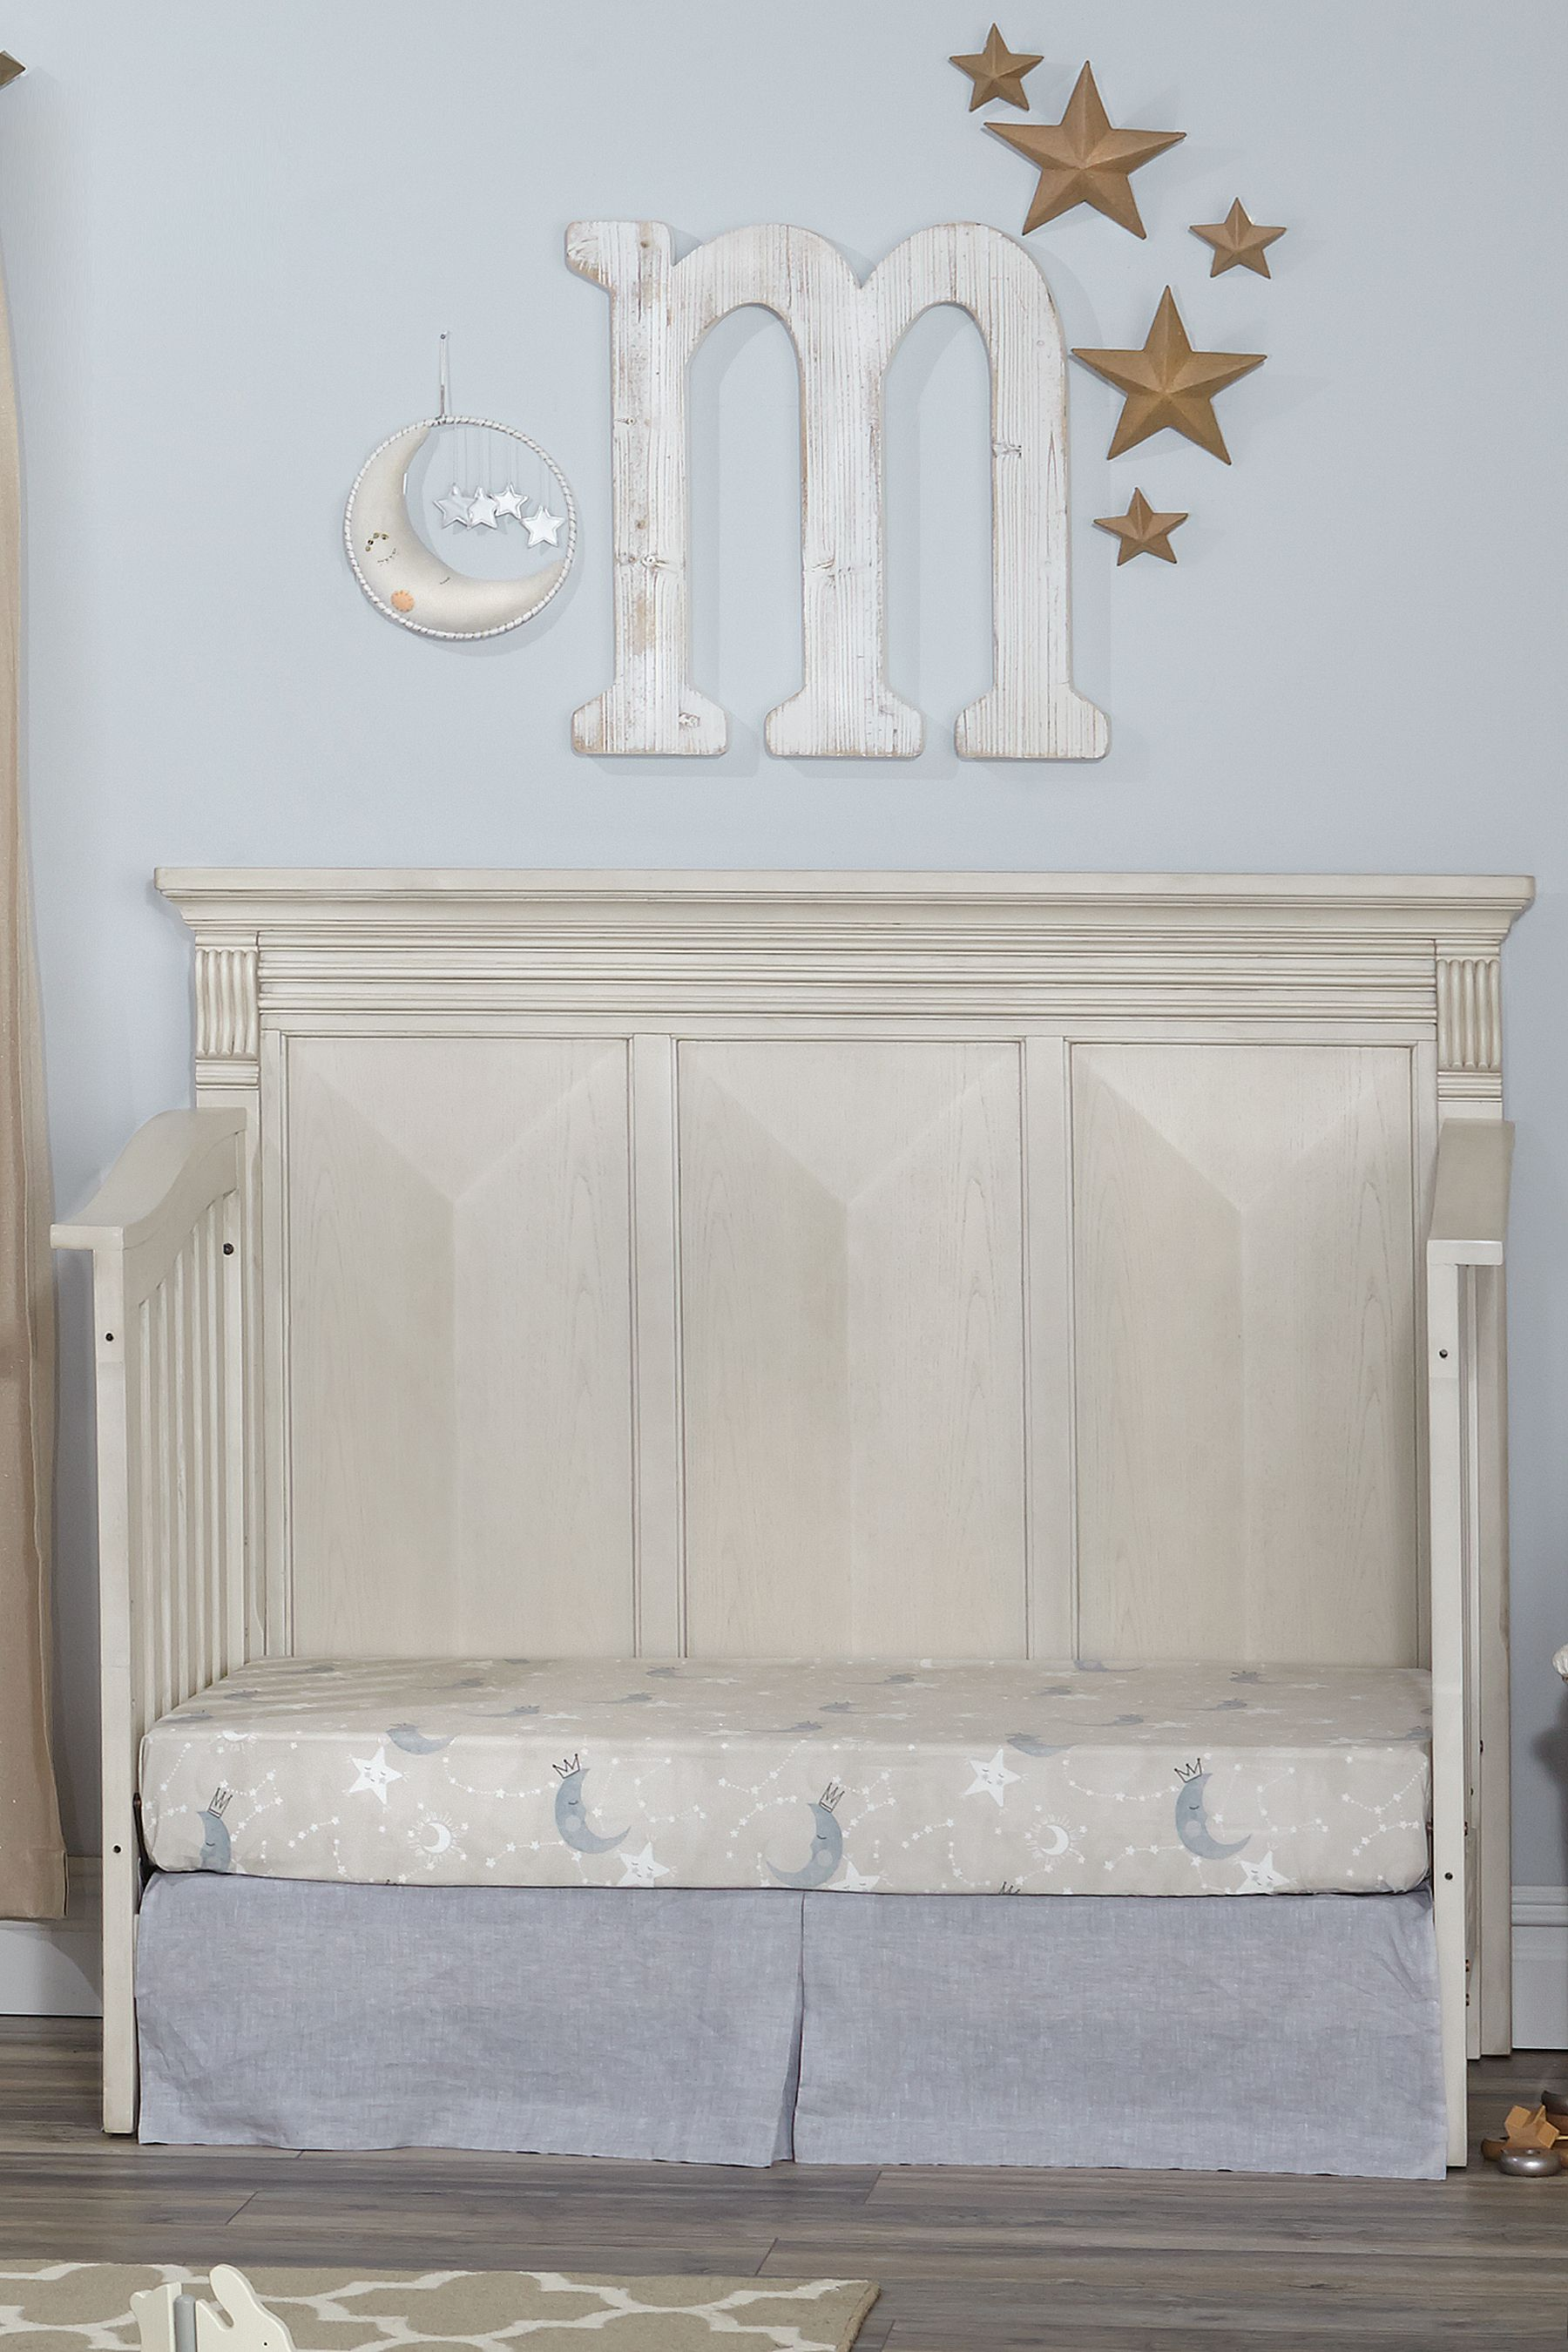 Sealed Grow Room Design: Kingsley Sedona 4-in-1 Convertible Crib In Vintage Ivory